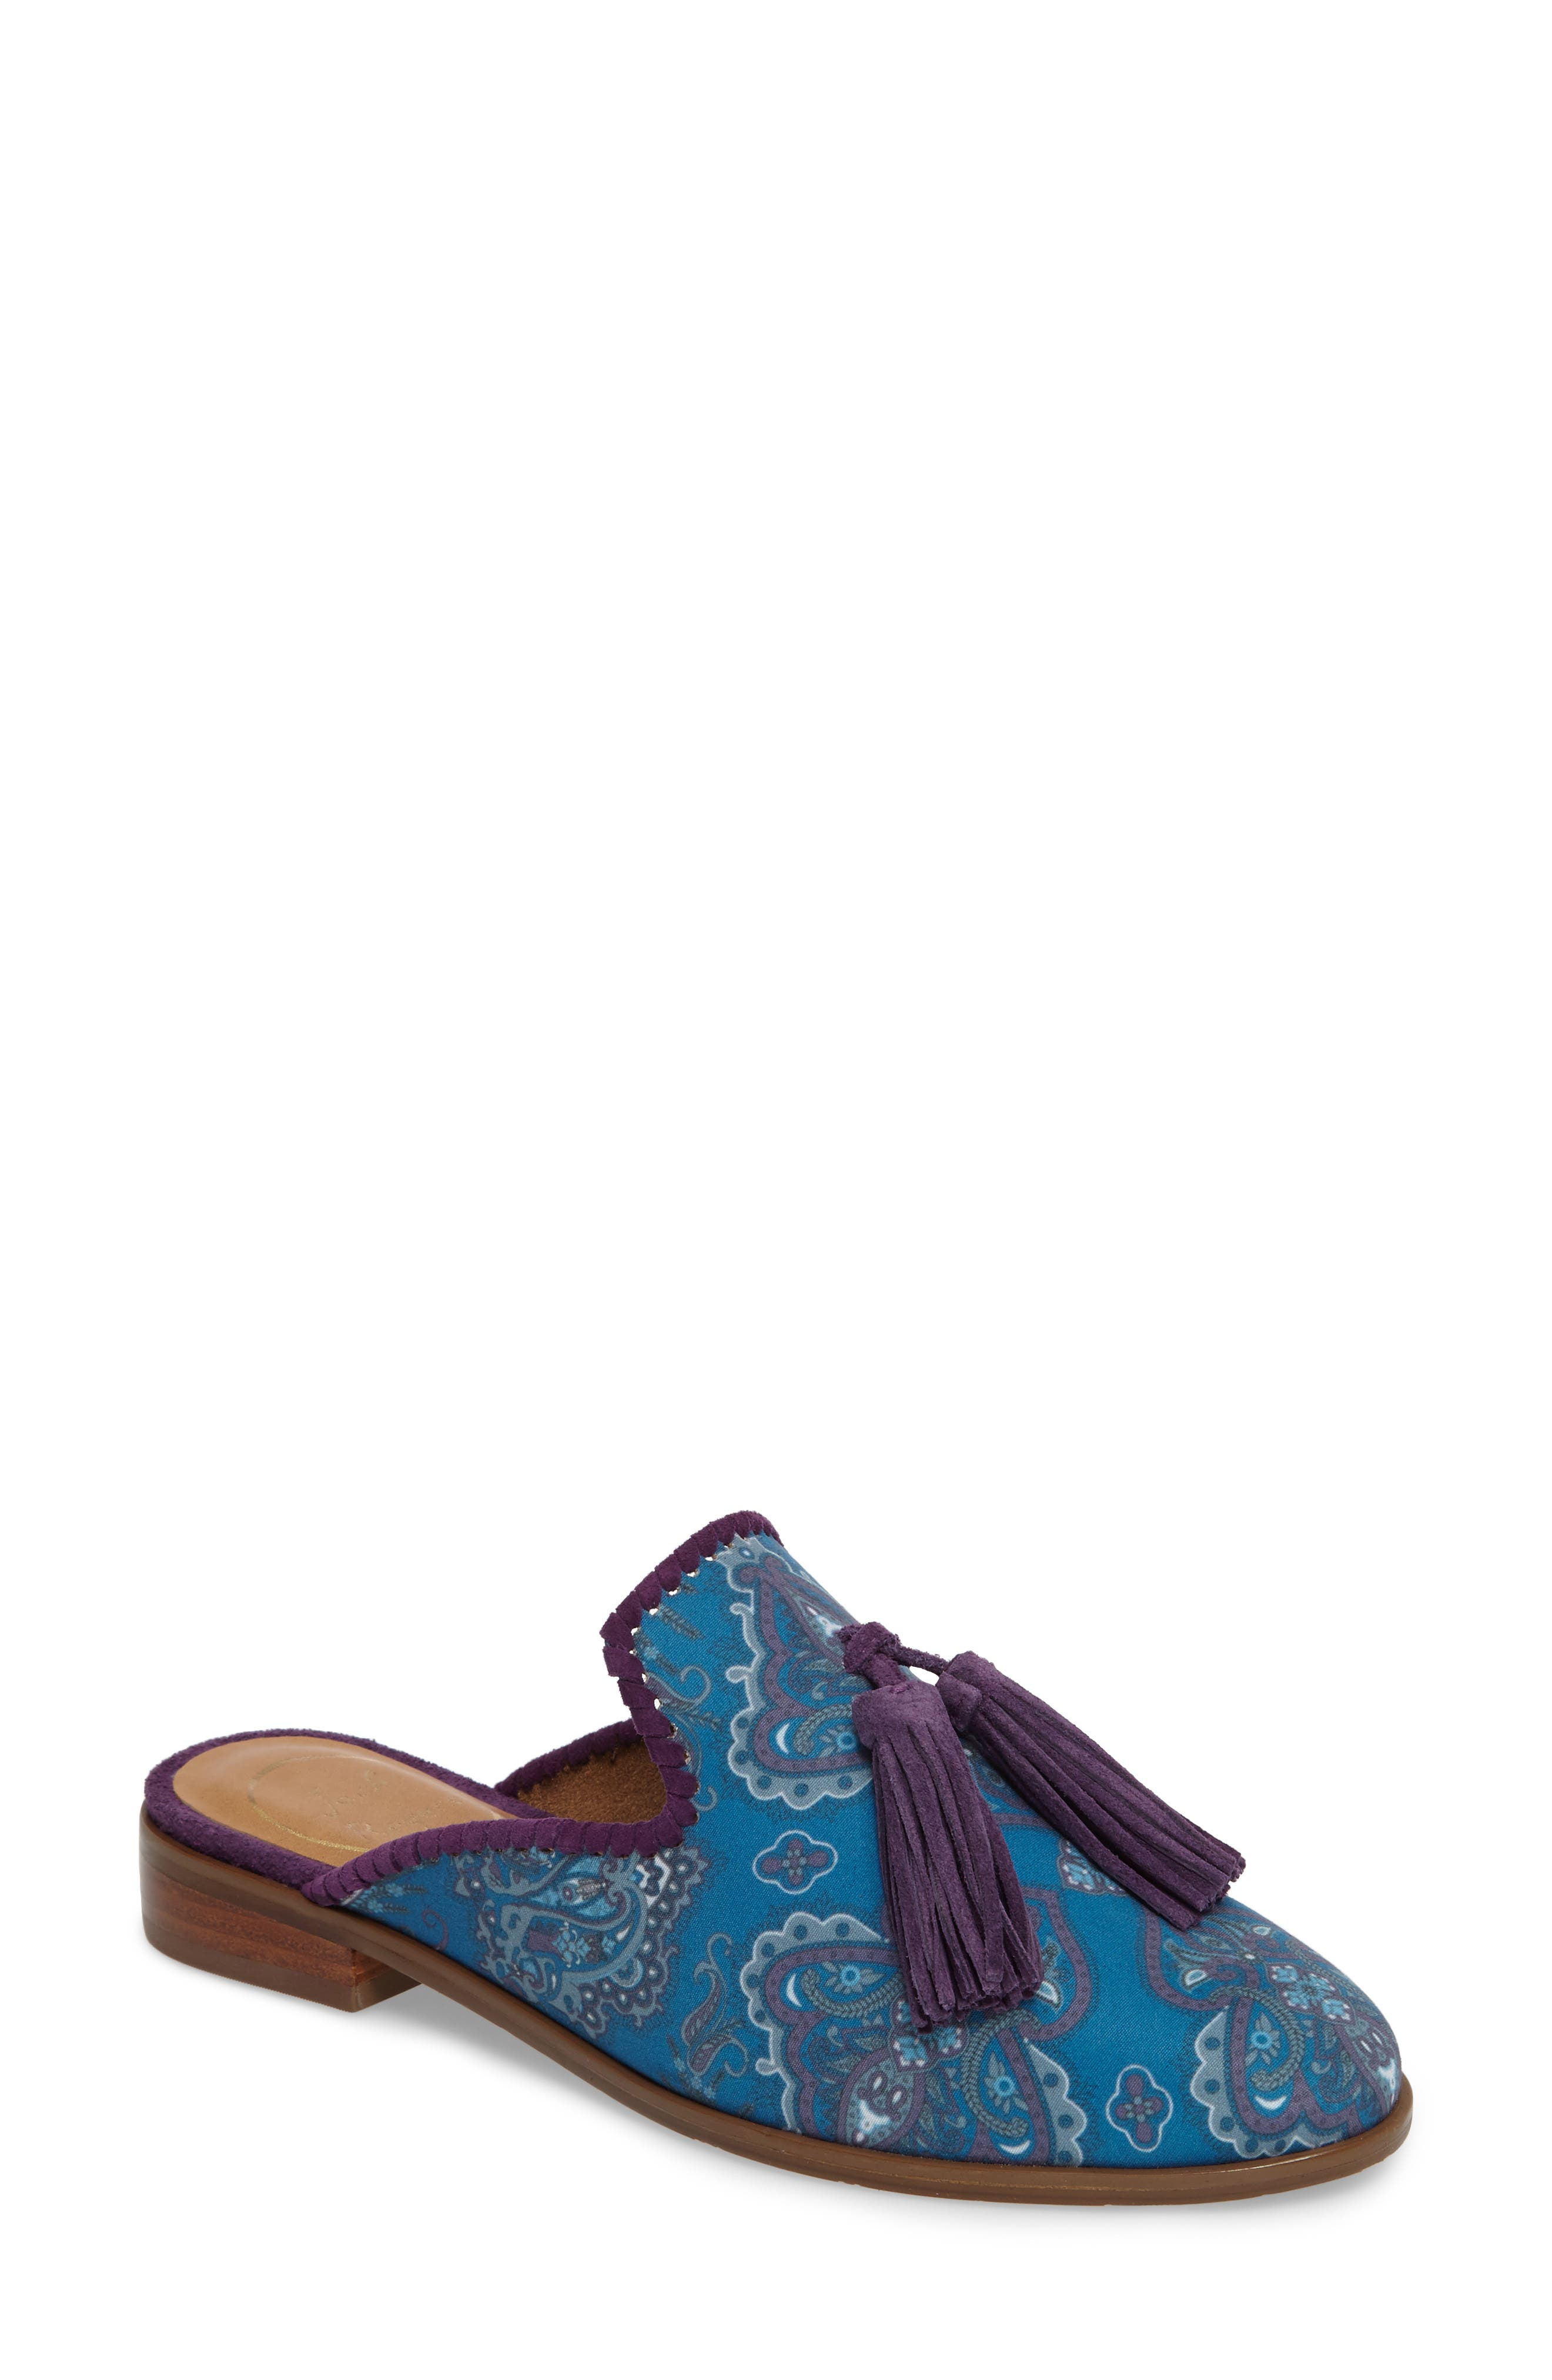 Delaney Tassel Mule,                             Main thumbnail 1, color,                             Blue Paisley Fabric